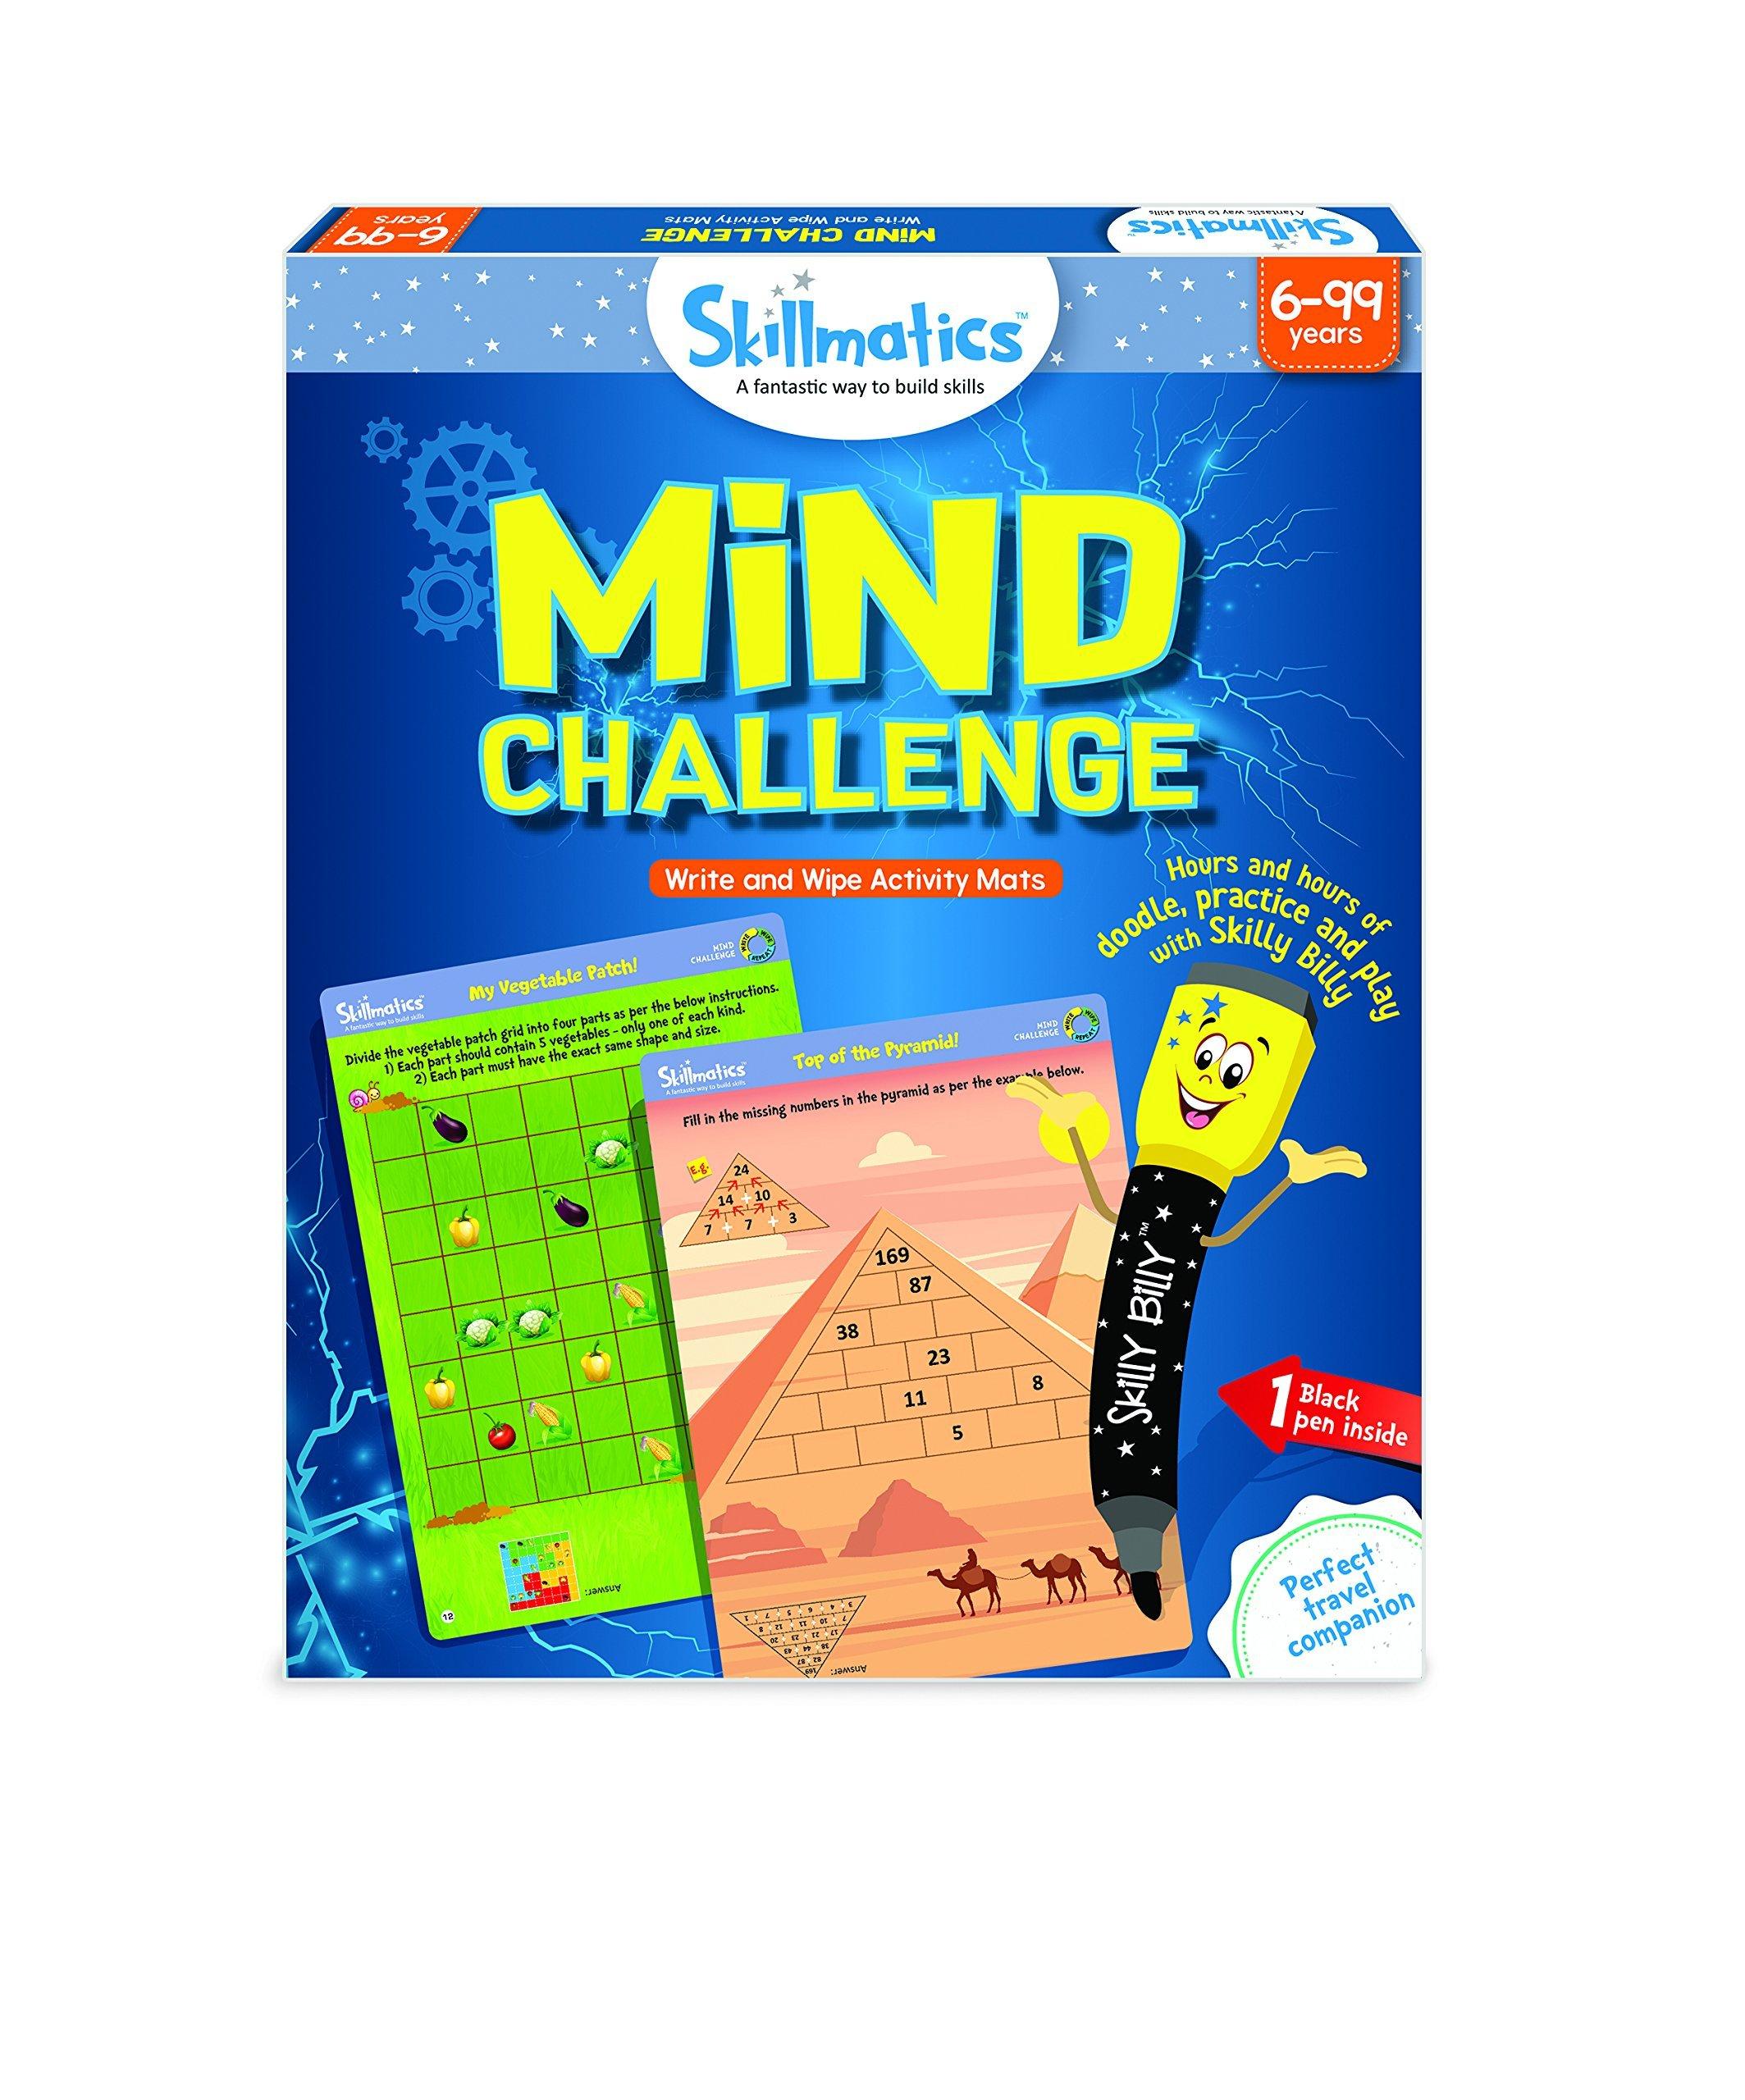 Skillmatics Educational Game: Mind Challenge 6-99 Years